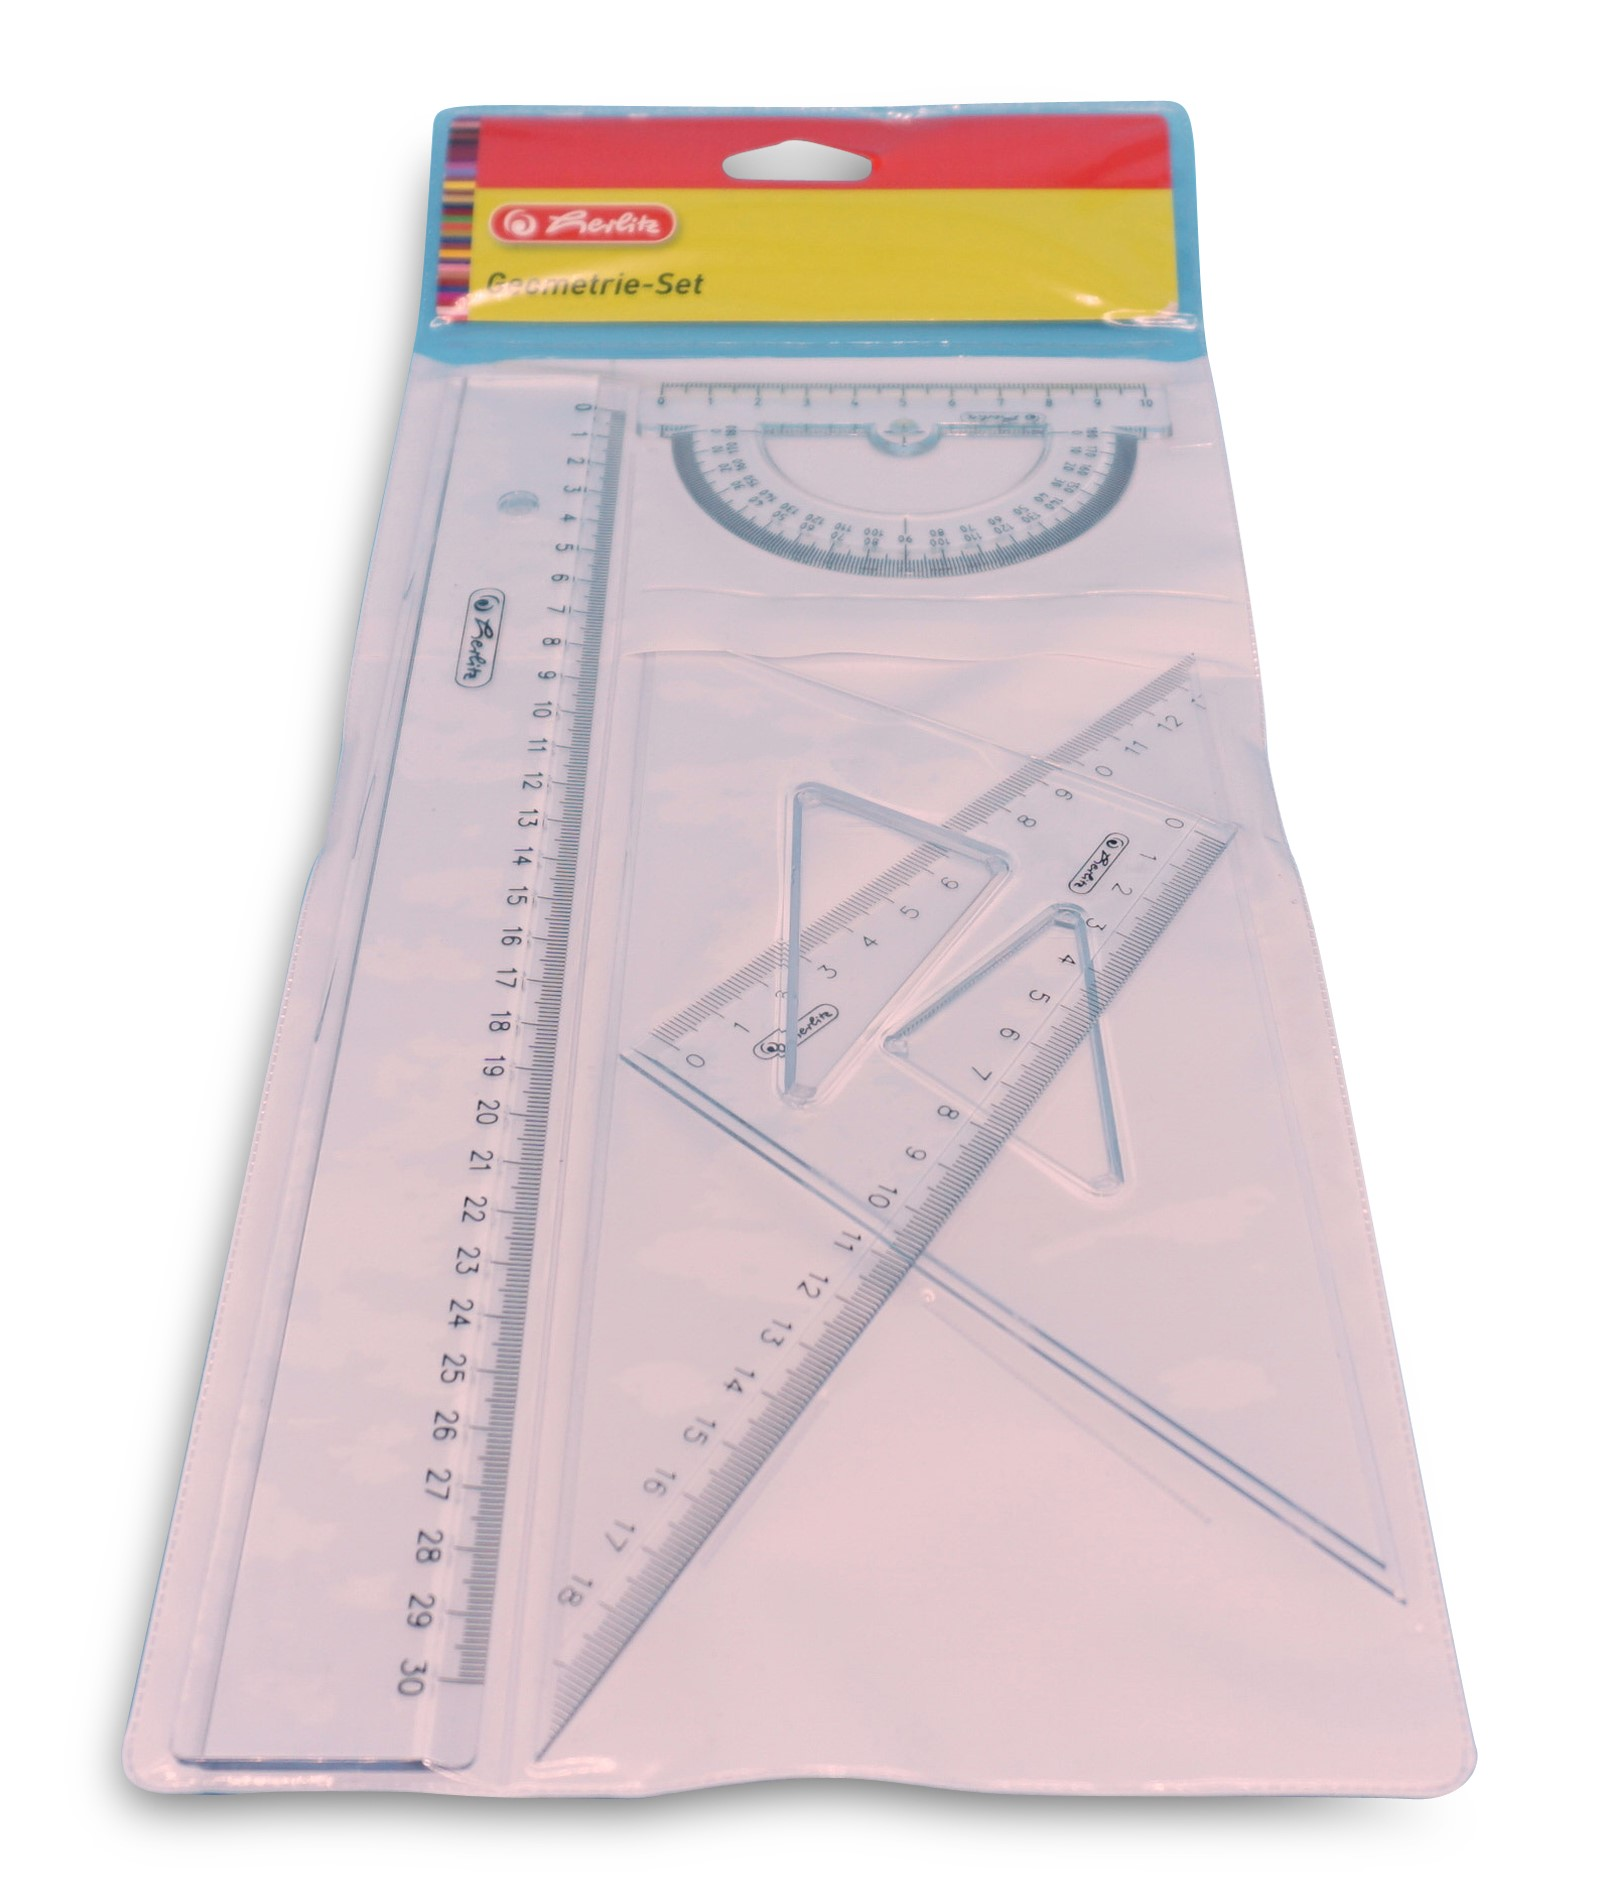 Herlitz  Lineal-Set, 4-teilig:  Lineal 30 cm, Winkelmesser, 2 Dreiecke